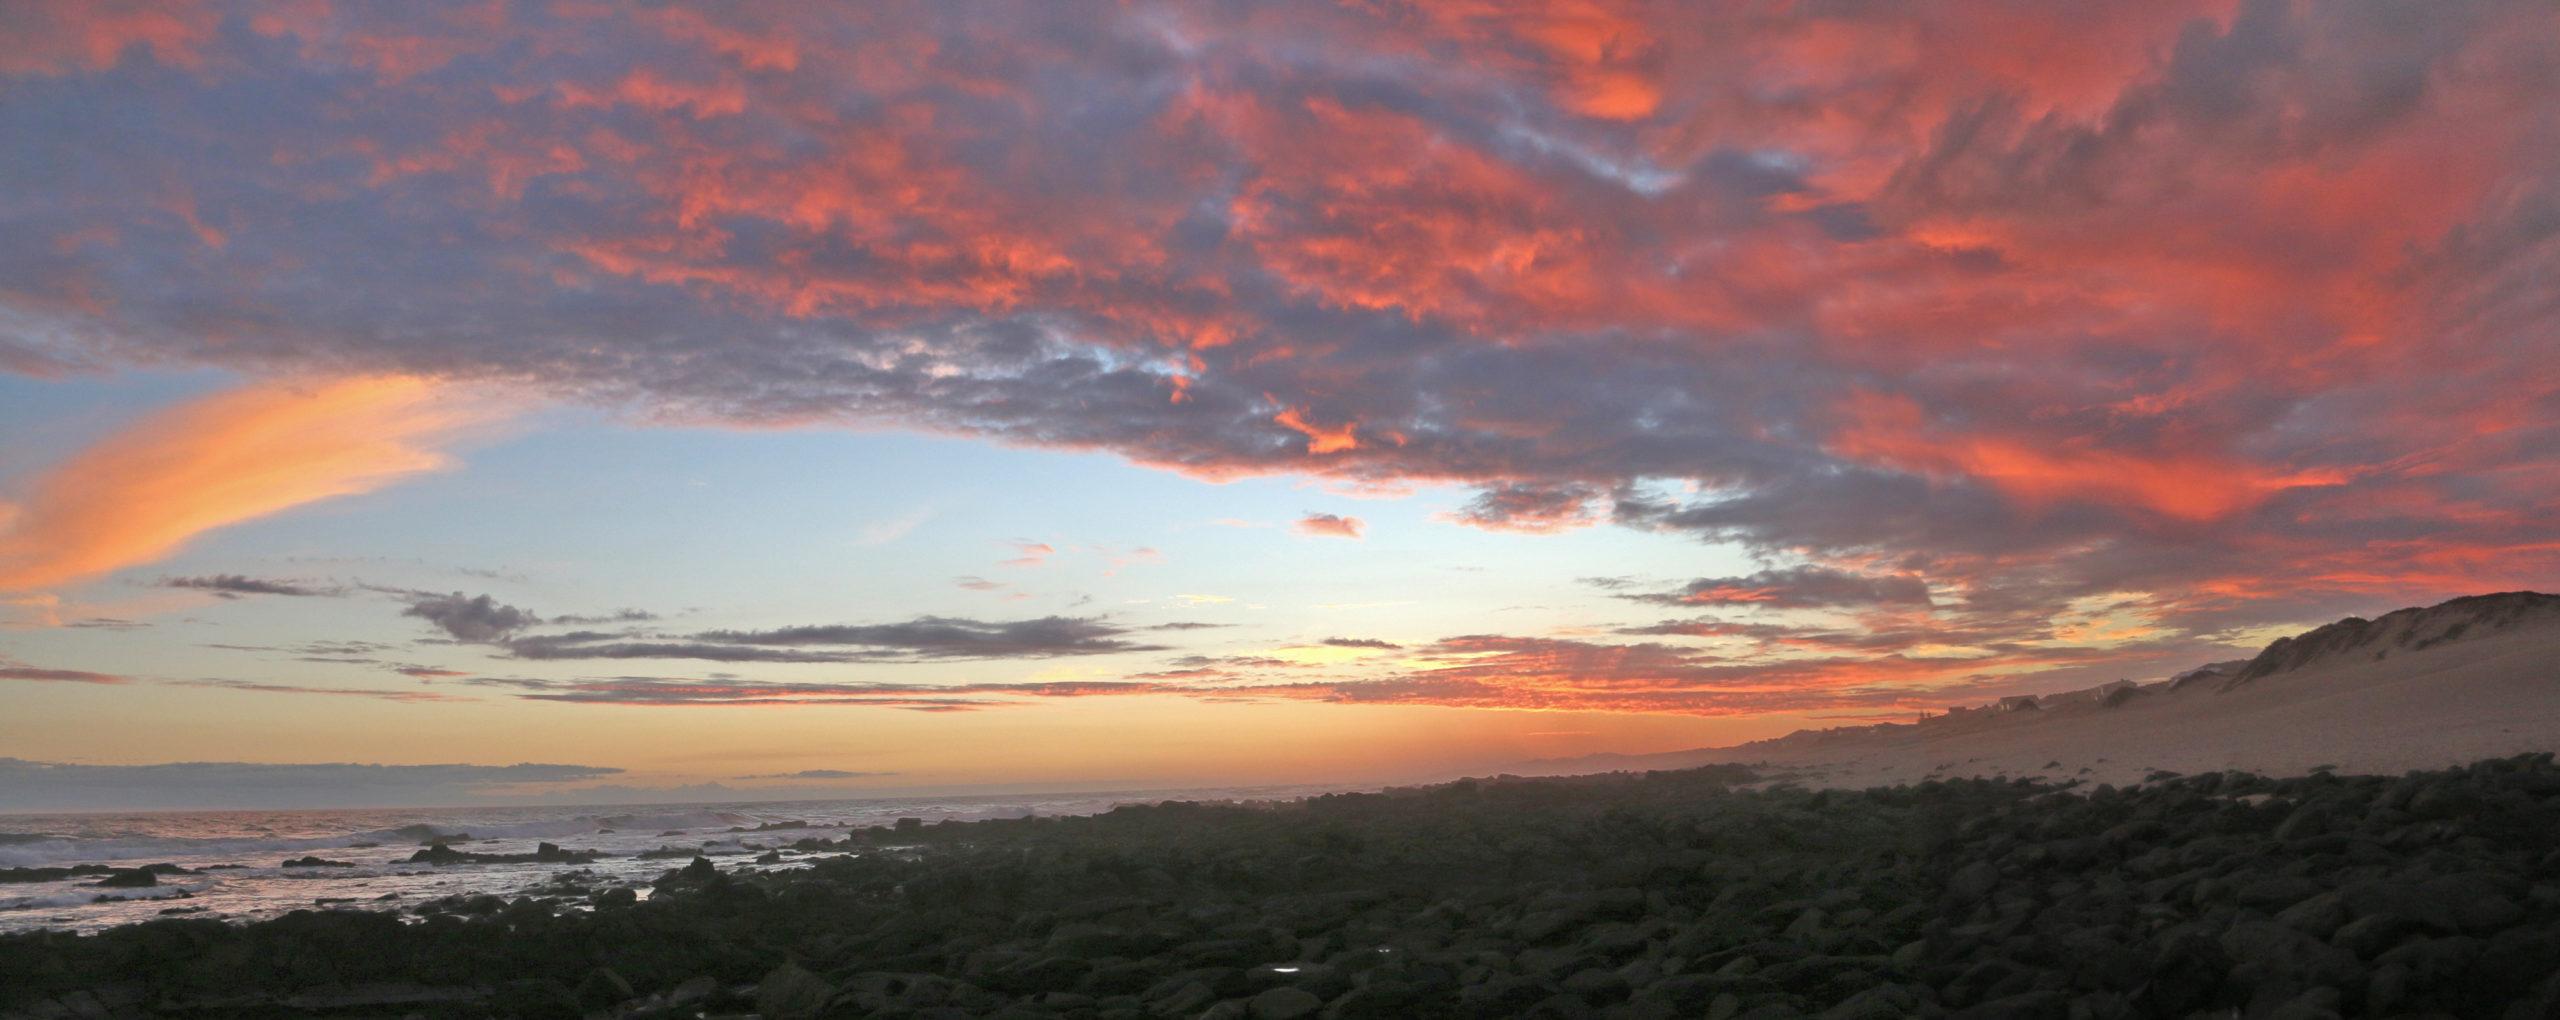 Cannon Rocks sunset